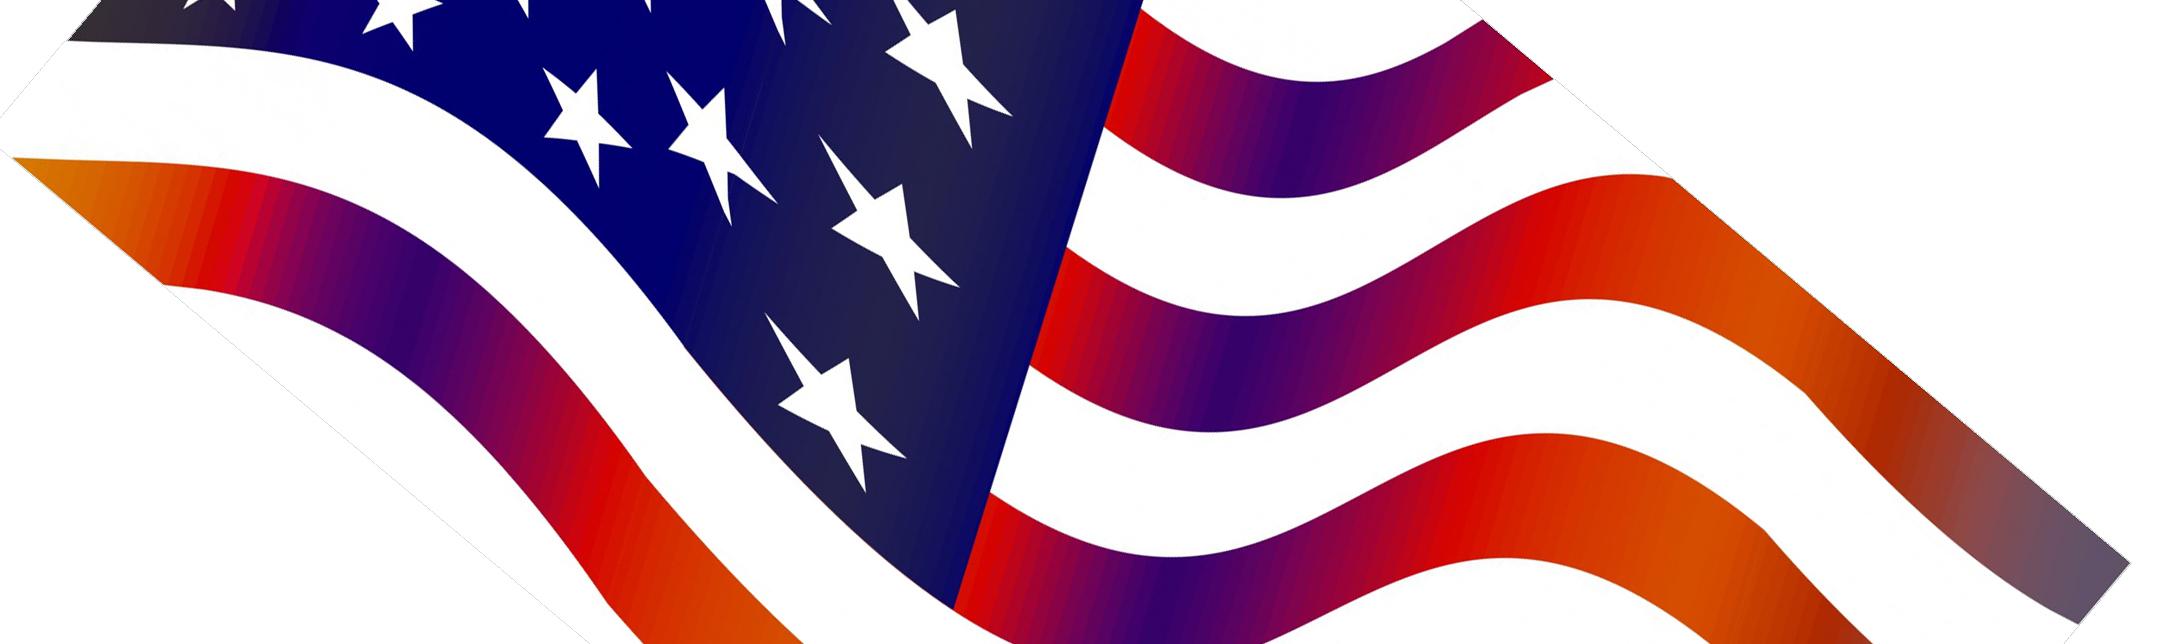 Patriotism & The Flag